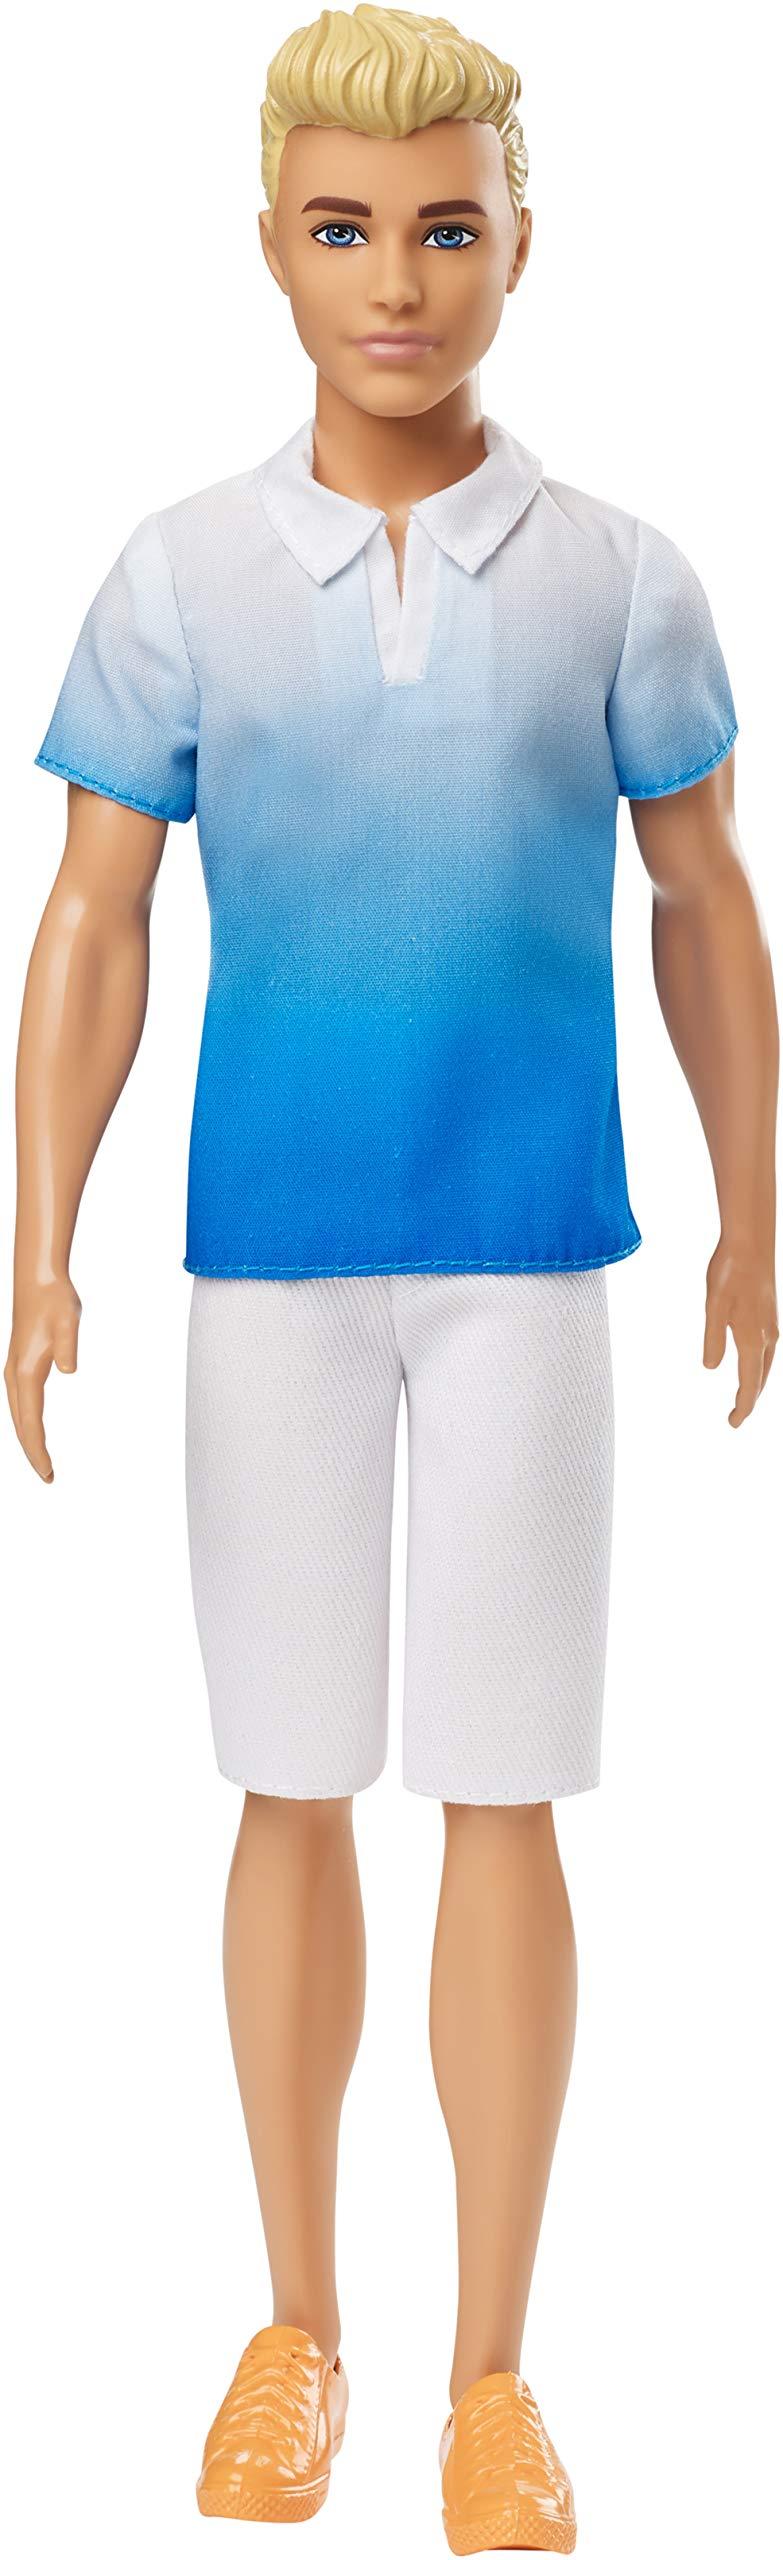 Barbie GDV12 Ken Fashionistas Doll with Blue Ombre Shirt